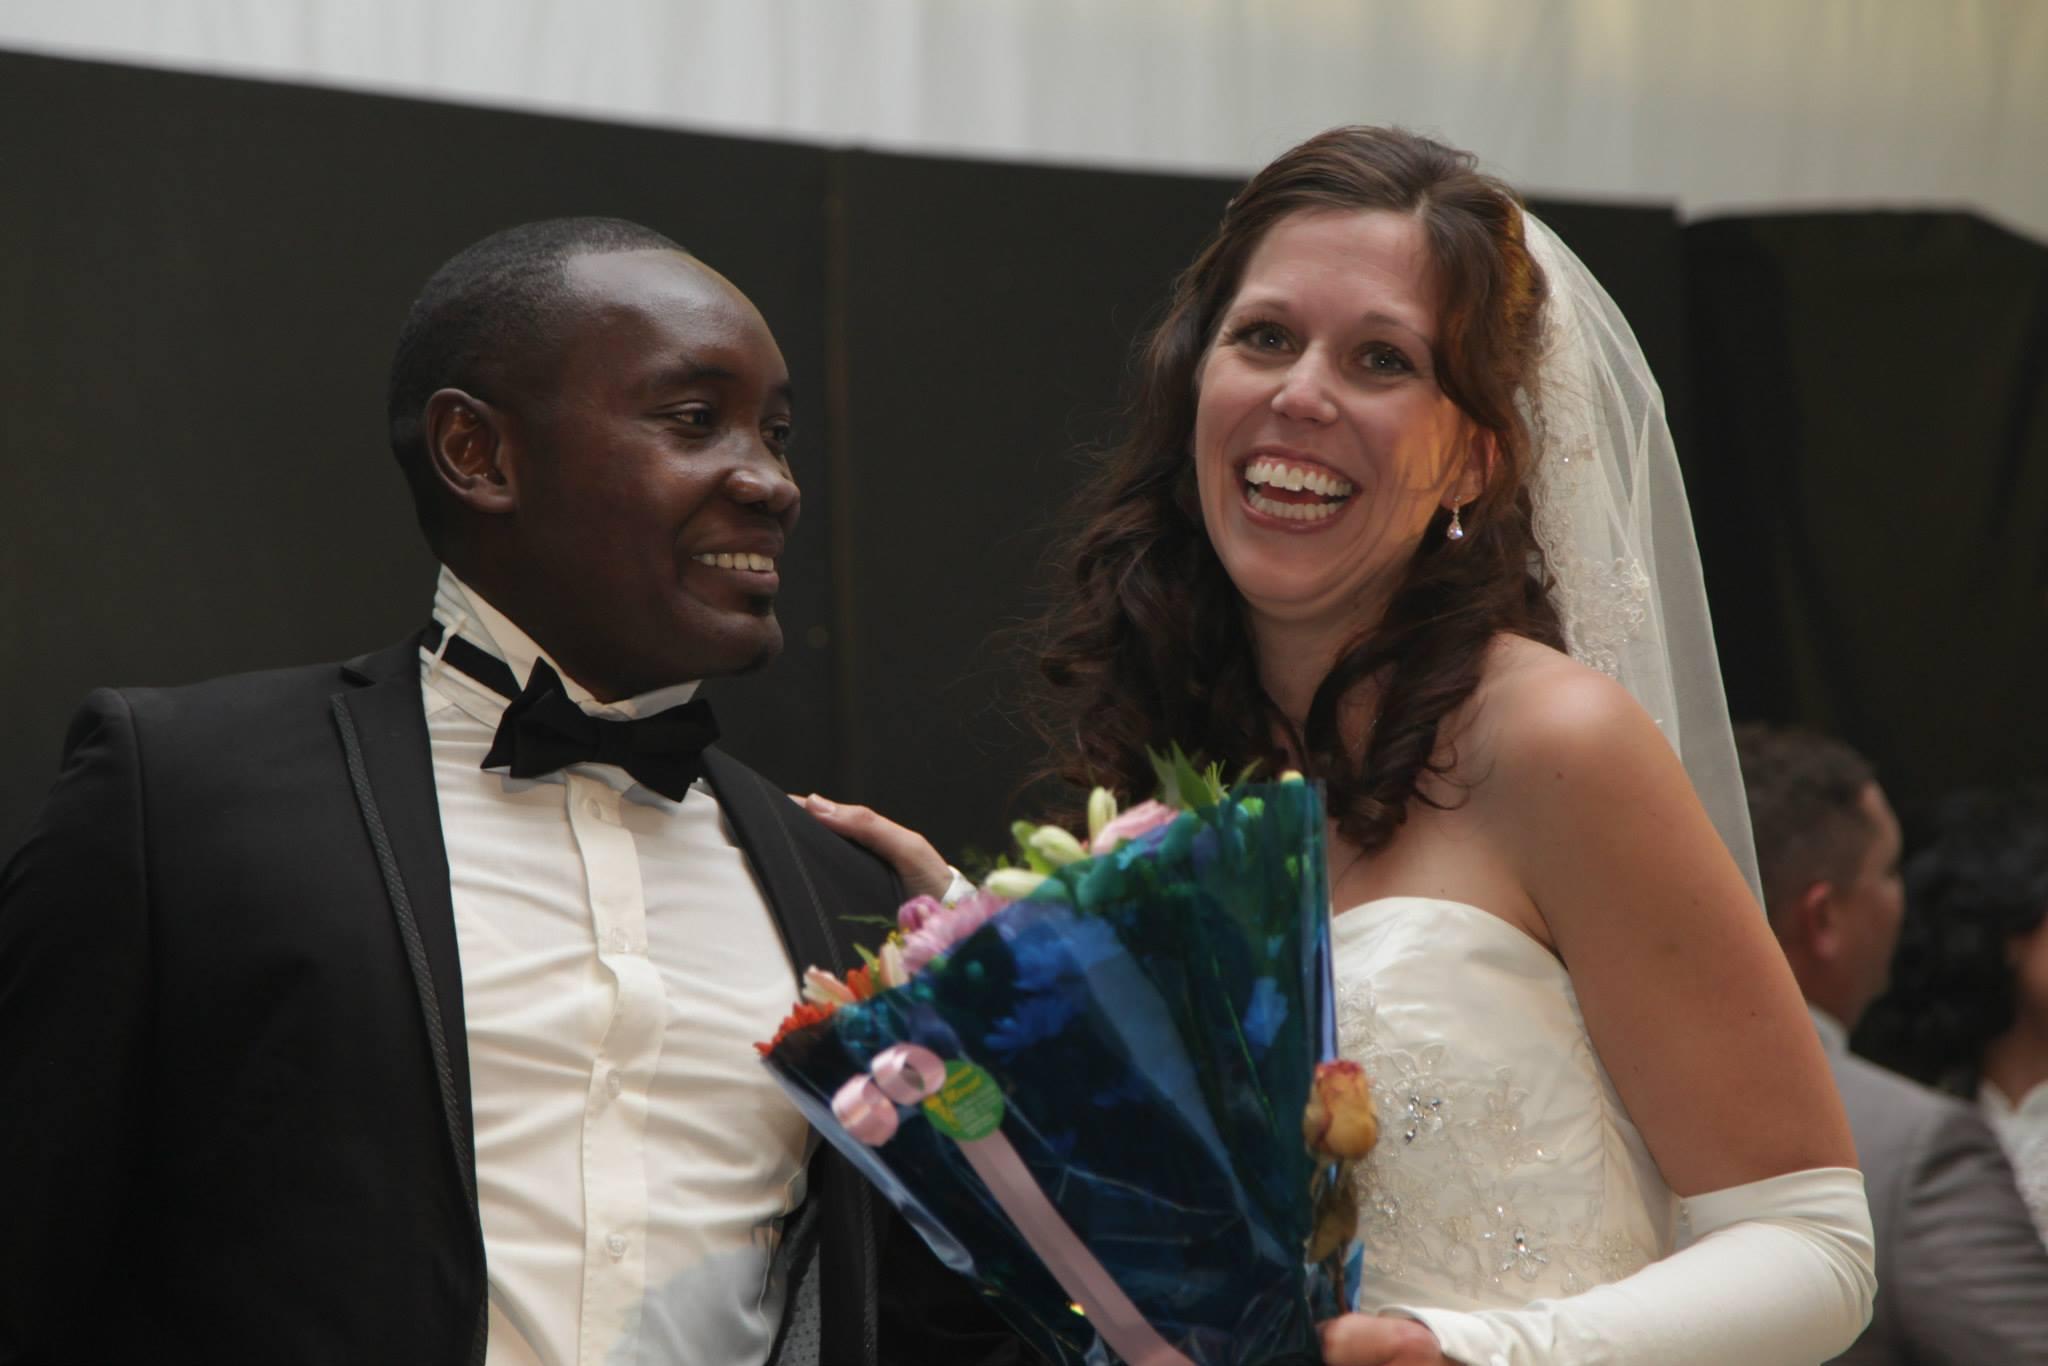 Winning Bridal Couple 2014: Patrick and Jennieke Kafuka. (Photo courtesy of Namibia Tourism Expo 2014 FB page)